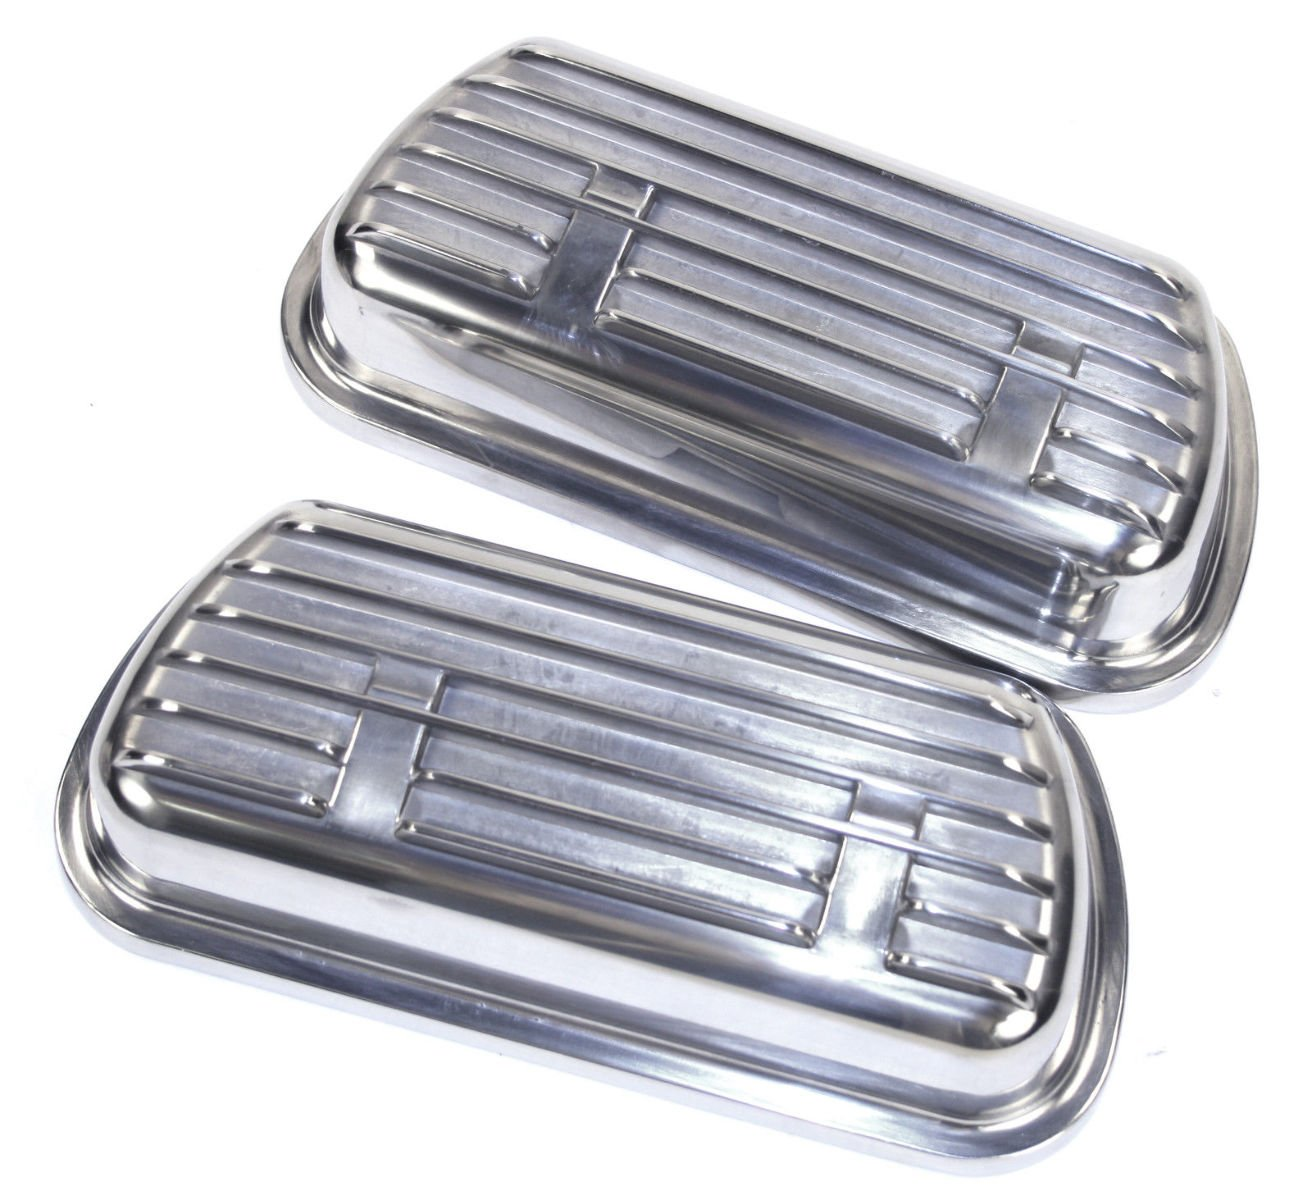 2 /& 3 Clip-On Aluminum Valve Cover Set Empi 00-9138-0 VW Type 1